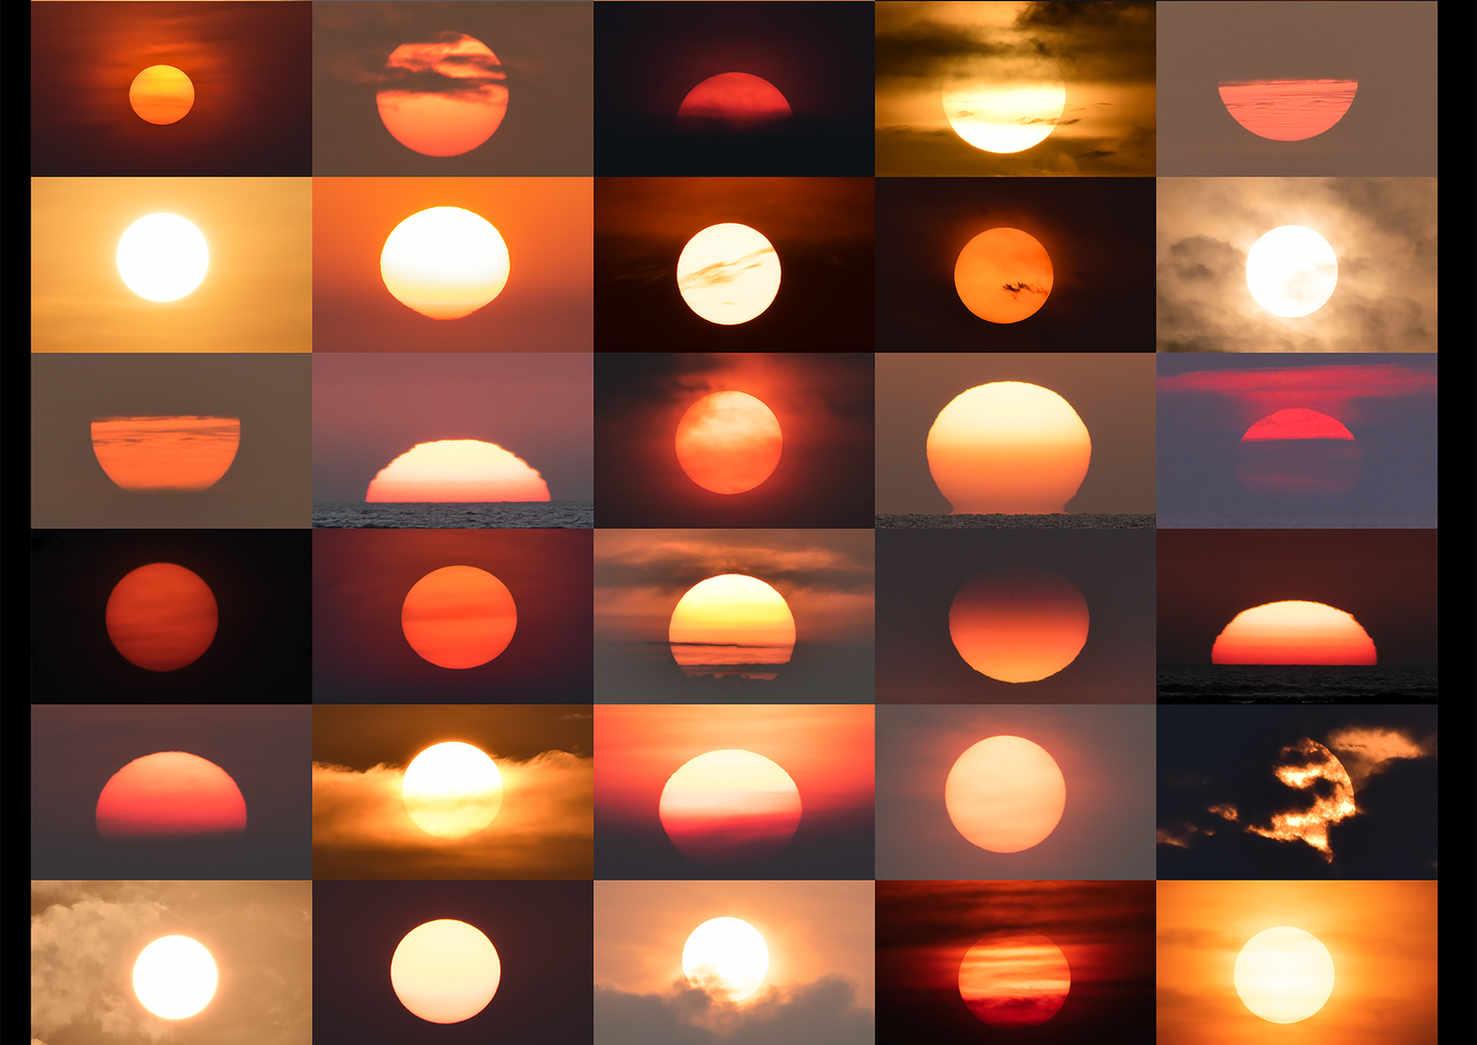 50 SHADES OF SUNSET